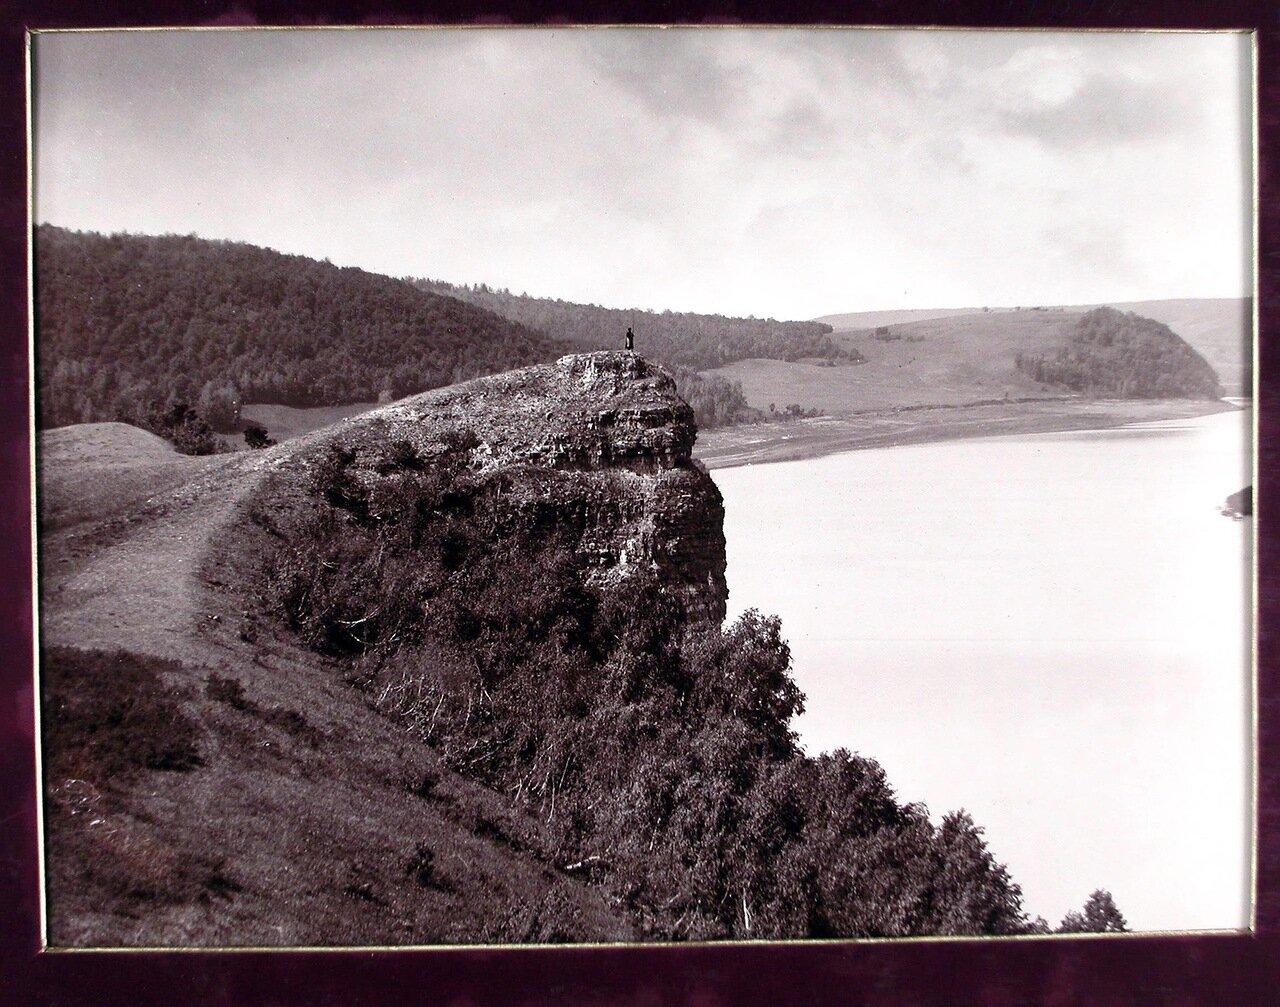 19. Вид горы Лепешки с Молодецкого кургана на берегу Волги